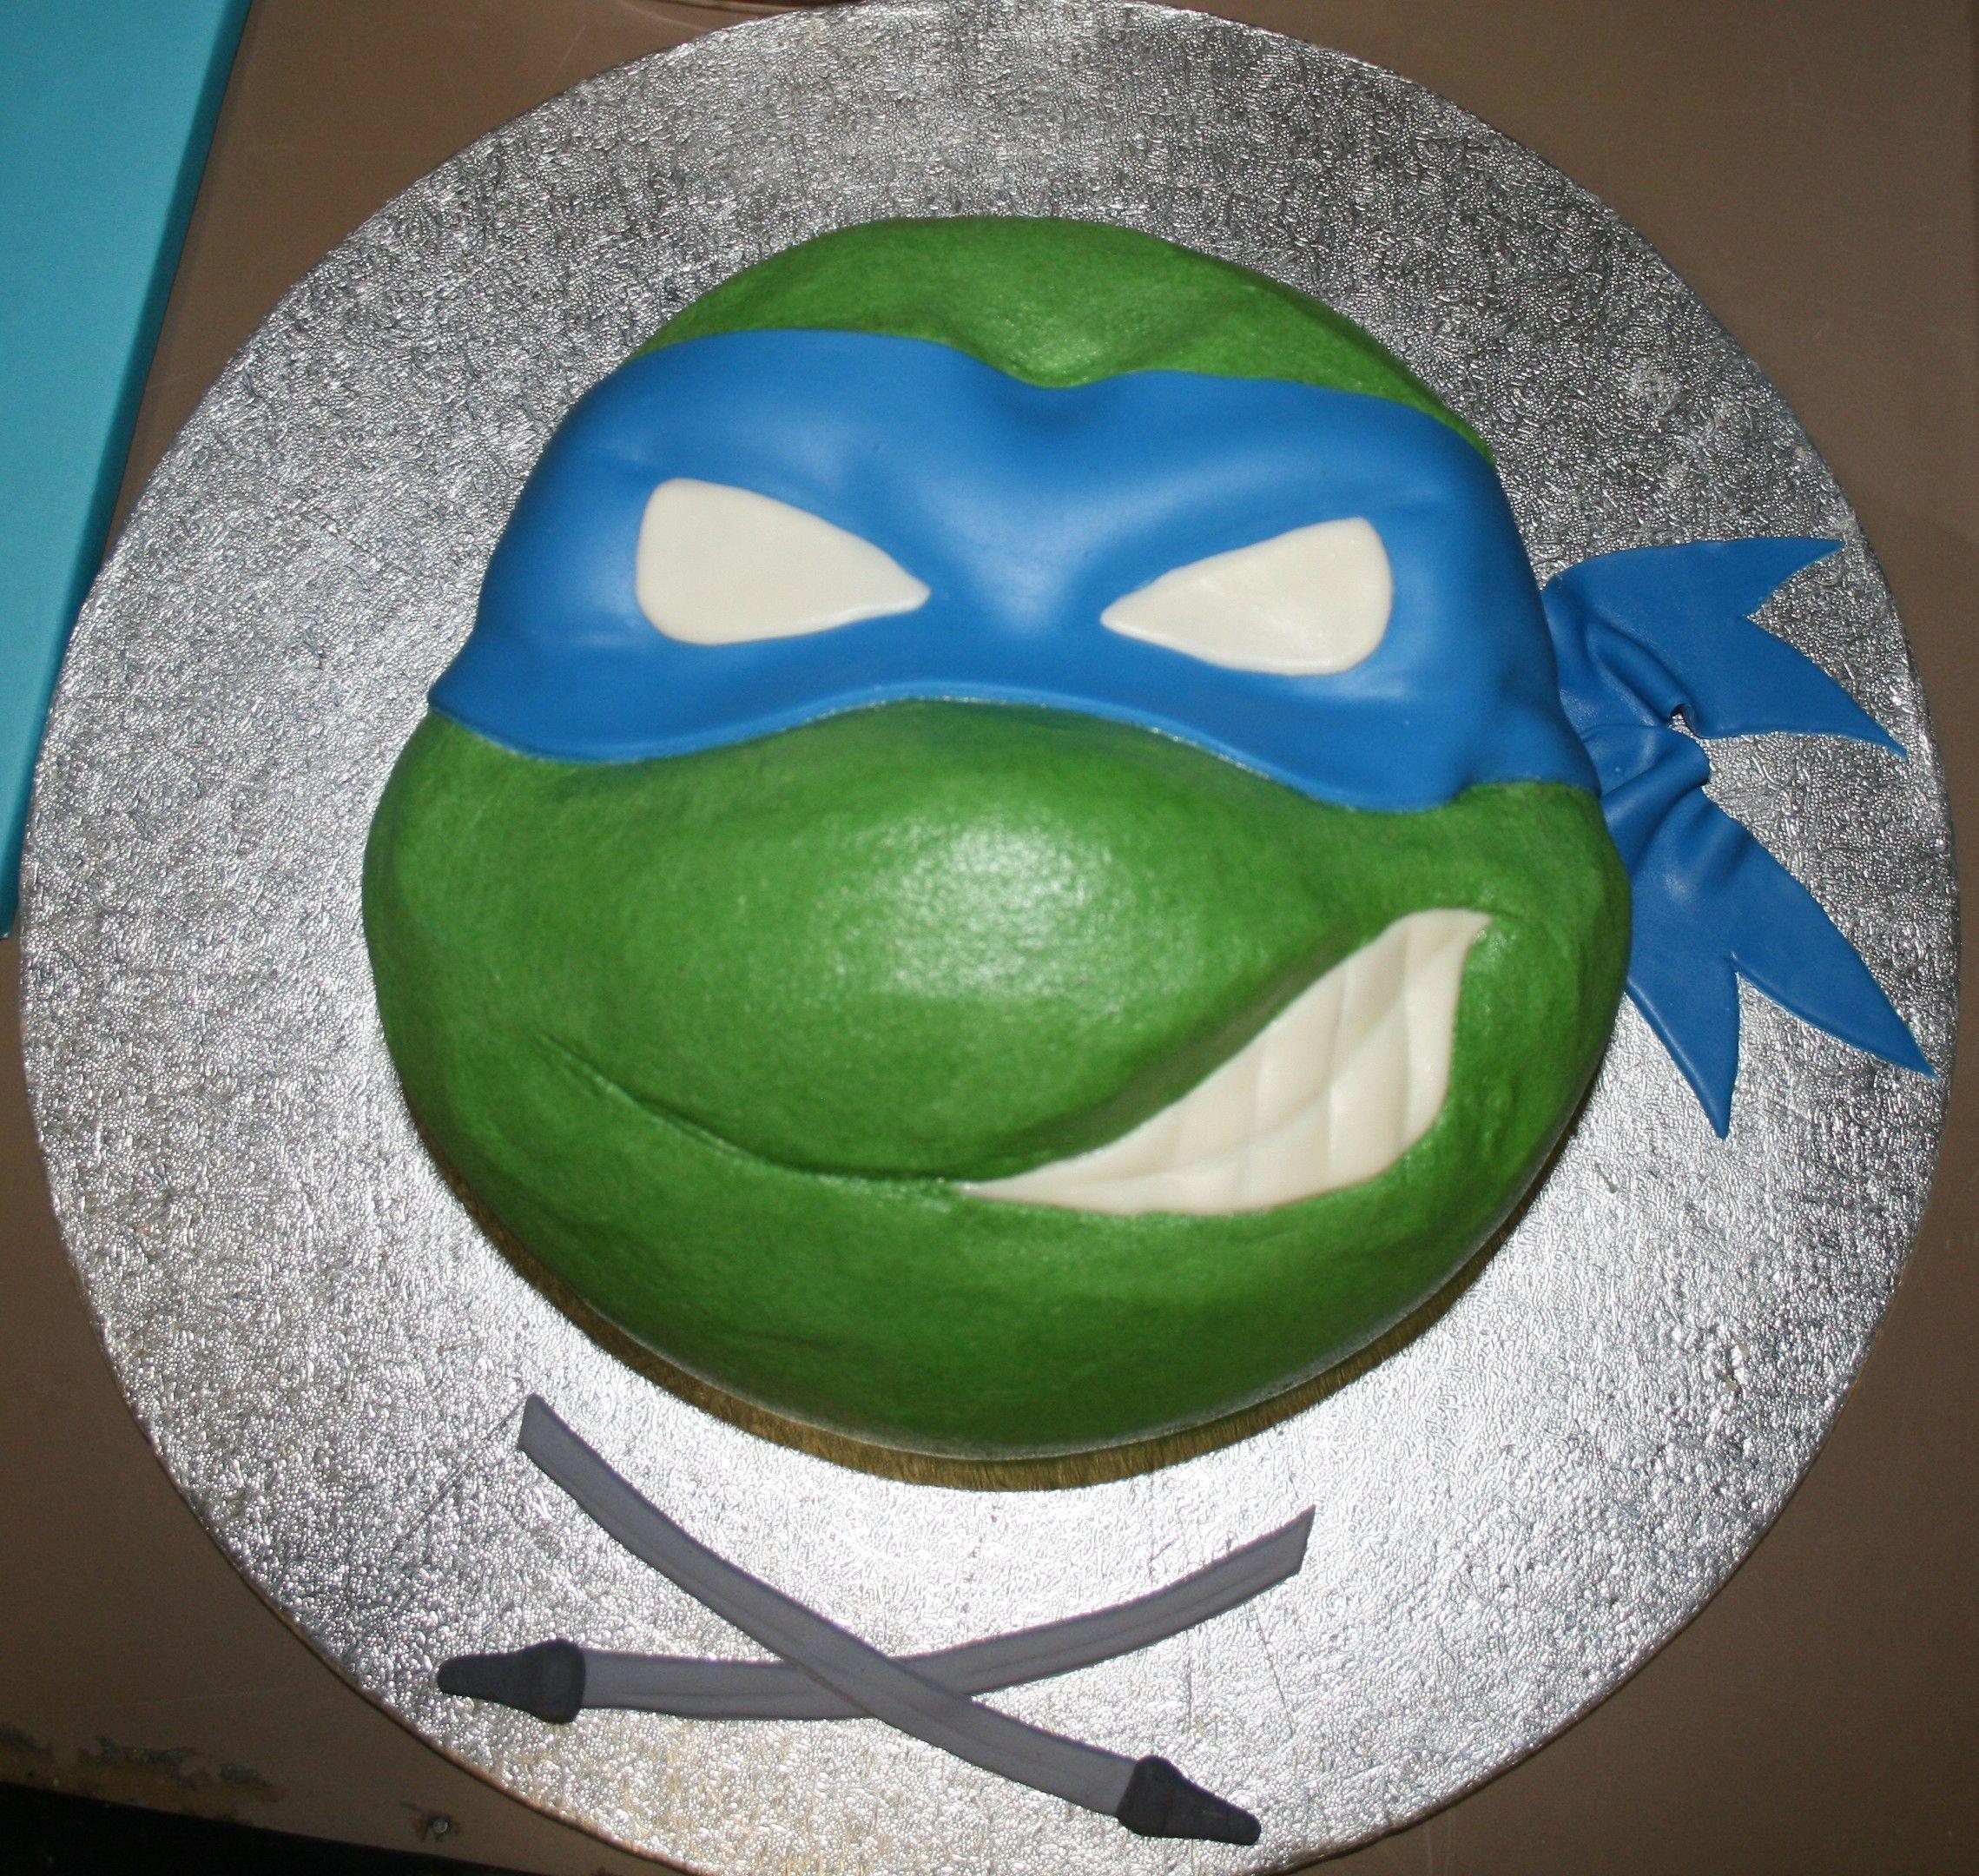 Leonardo A Ninja Turtle Cake For My Little Brothers 6th Birthday